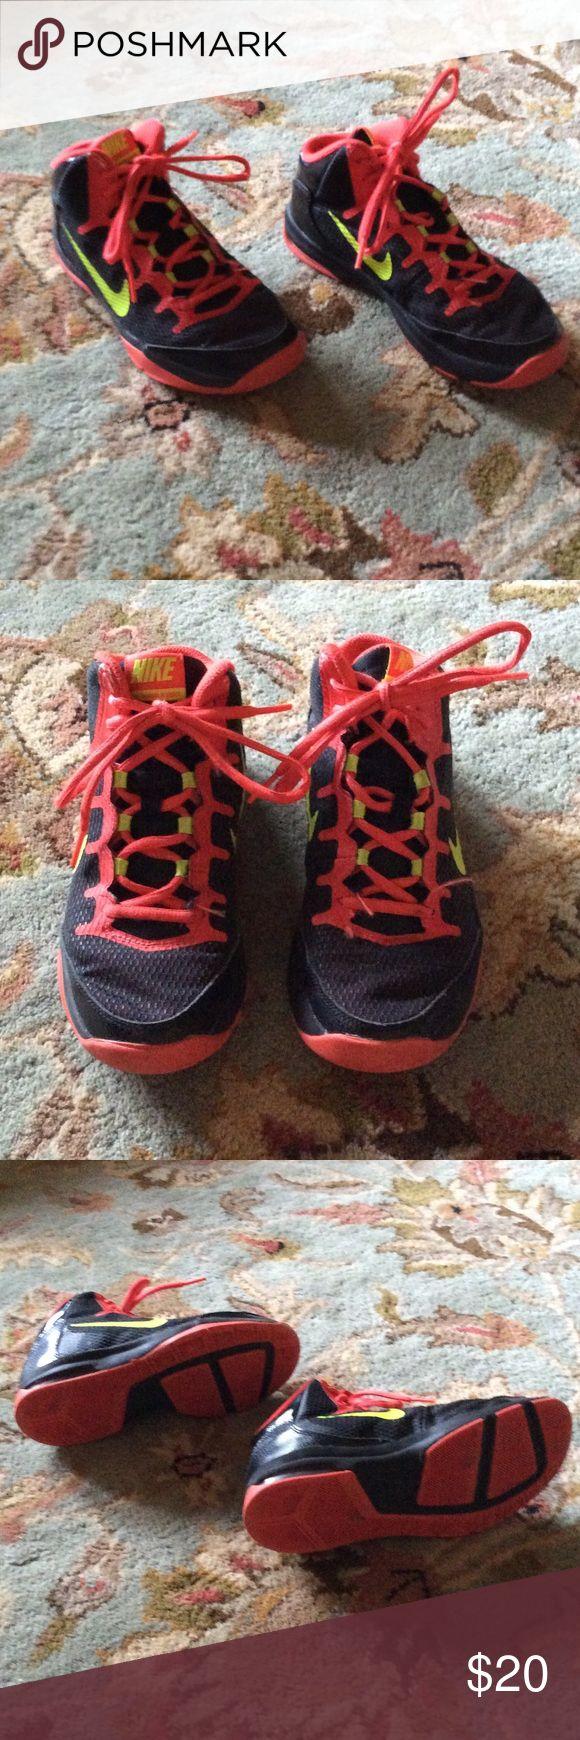 Nike hi tops Awesome Nike hi tops!  Black with orange trim and neon yellow swoosh.  Worn one season for basketball. Nike Shoes Sneakers